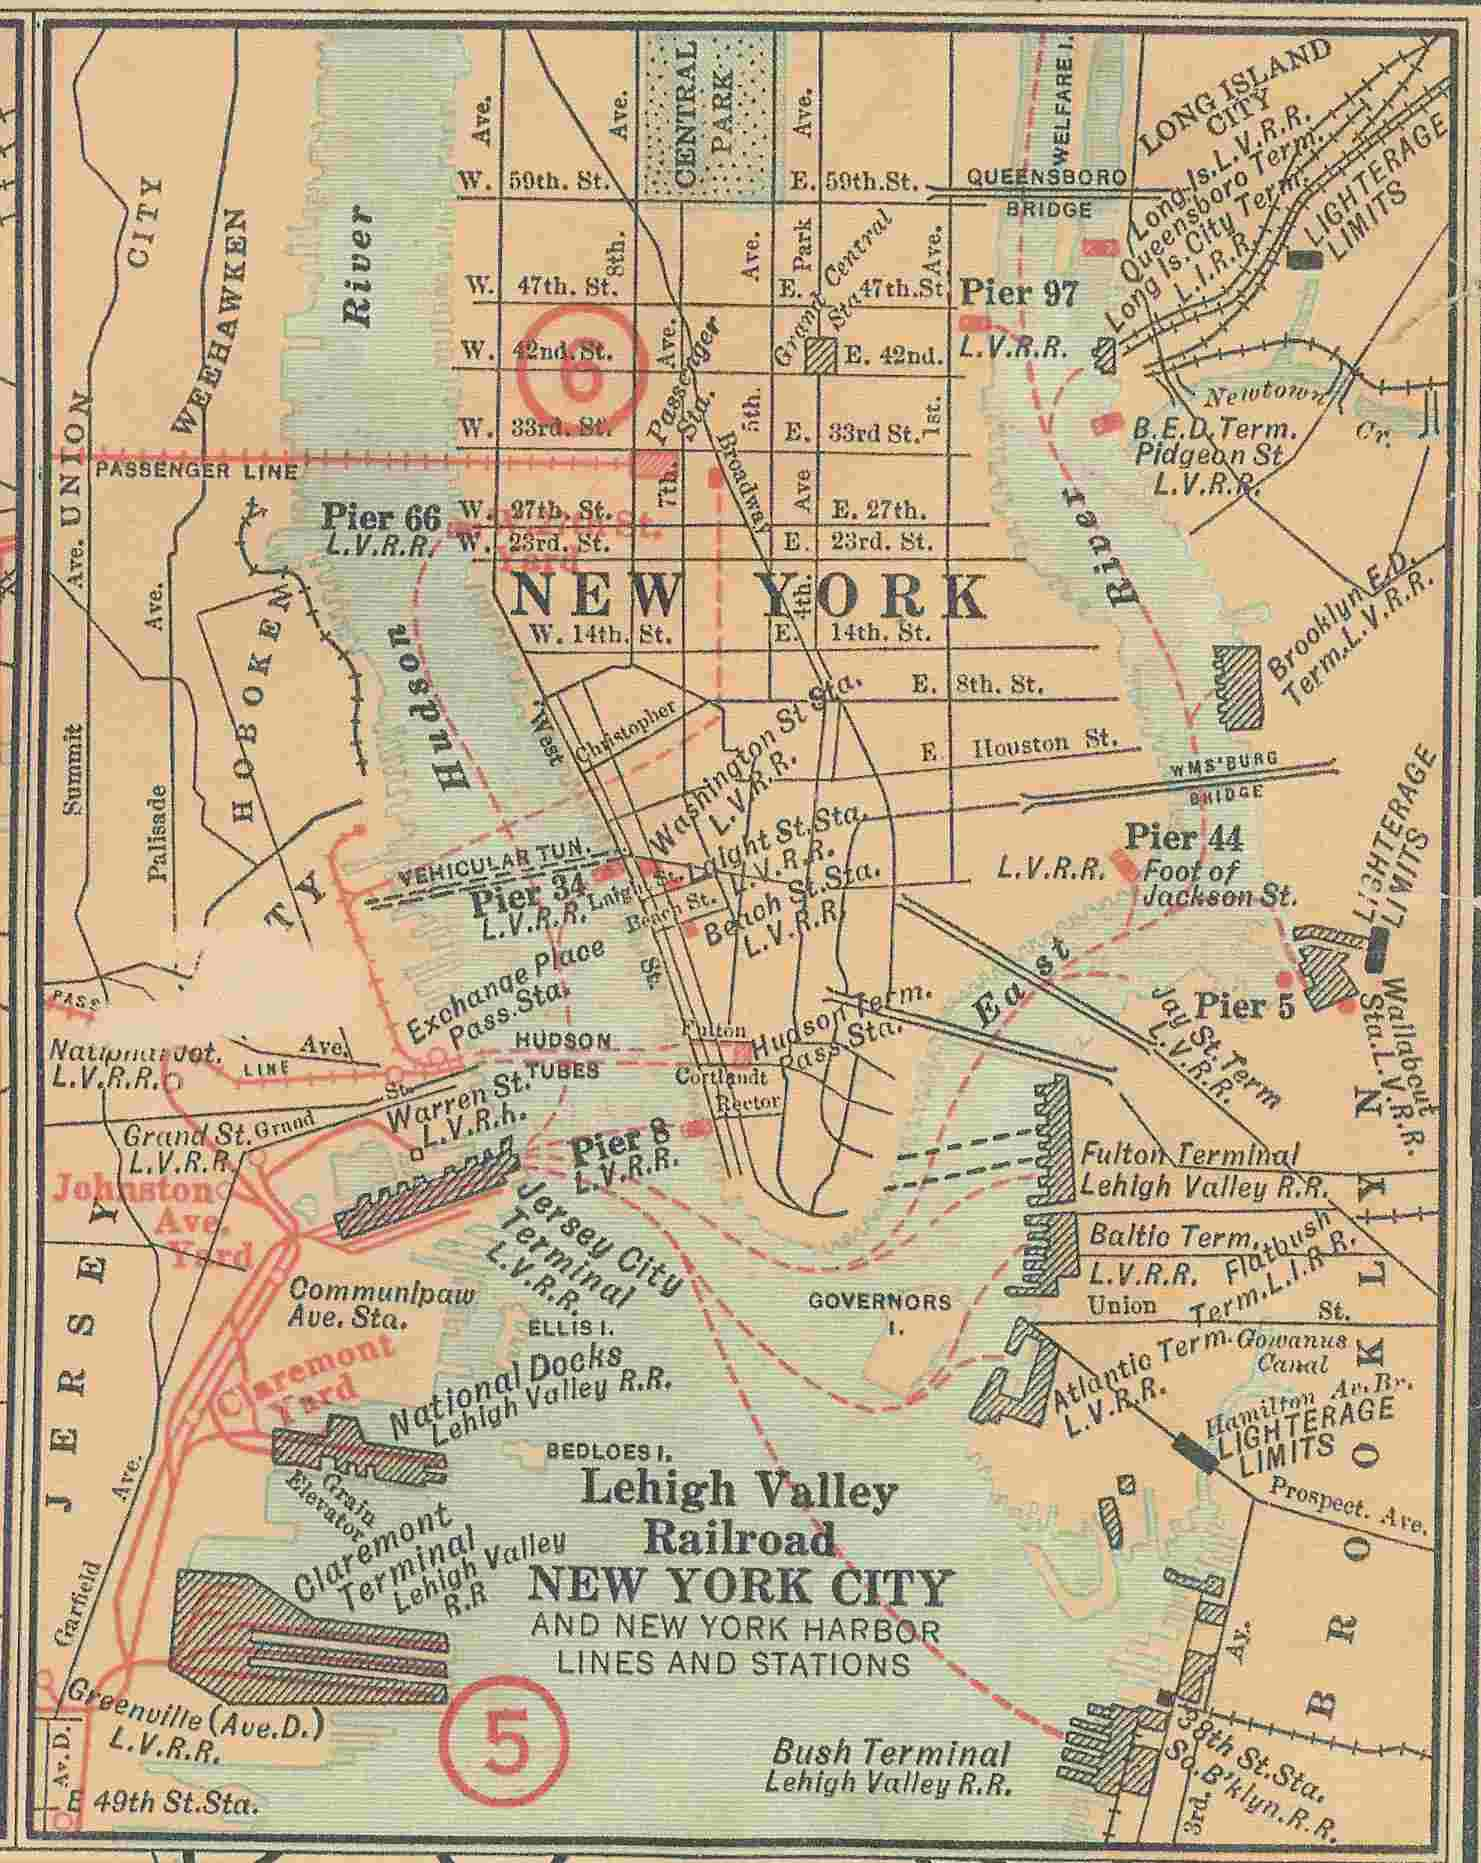 N.Y.C. Area Operations